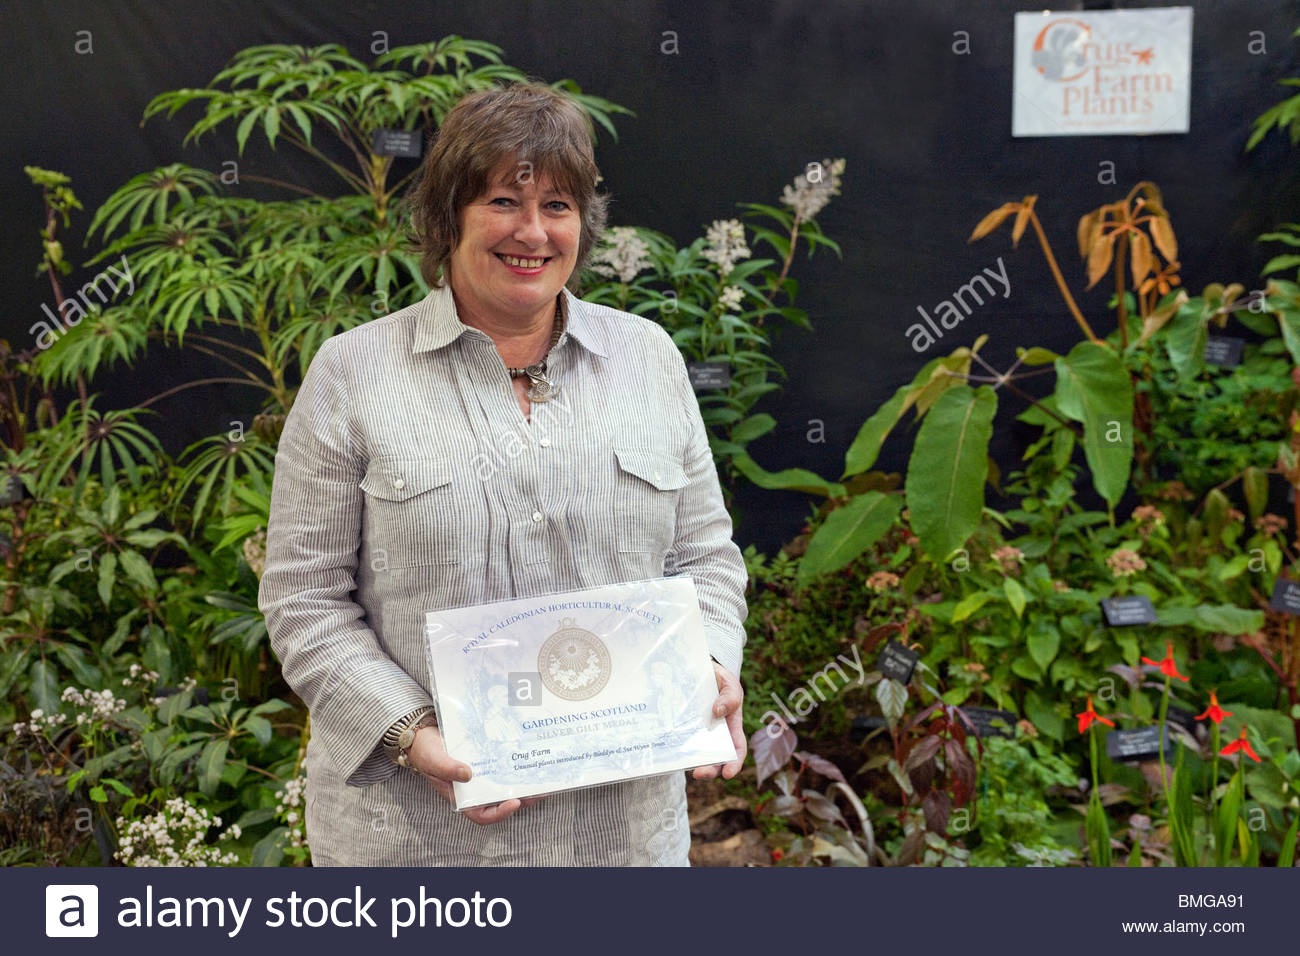 Sue Wynn Jones of Crug Farm Plants with Silver-Gilt medal at Gardening Scotland 2010 - Stock Image